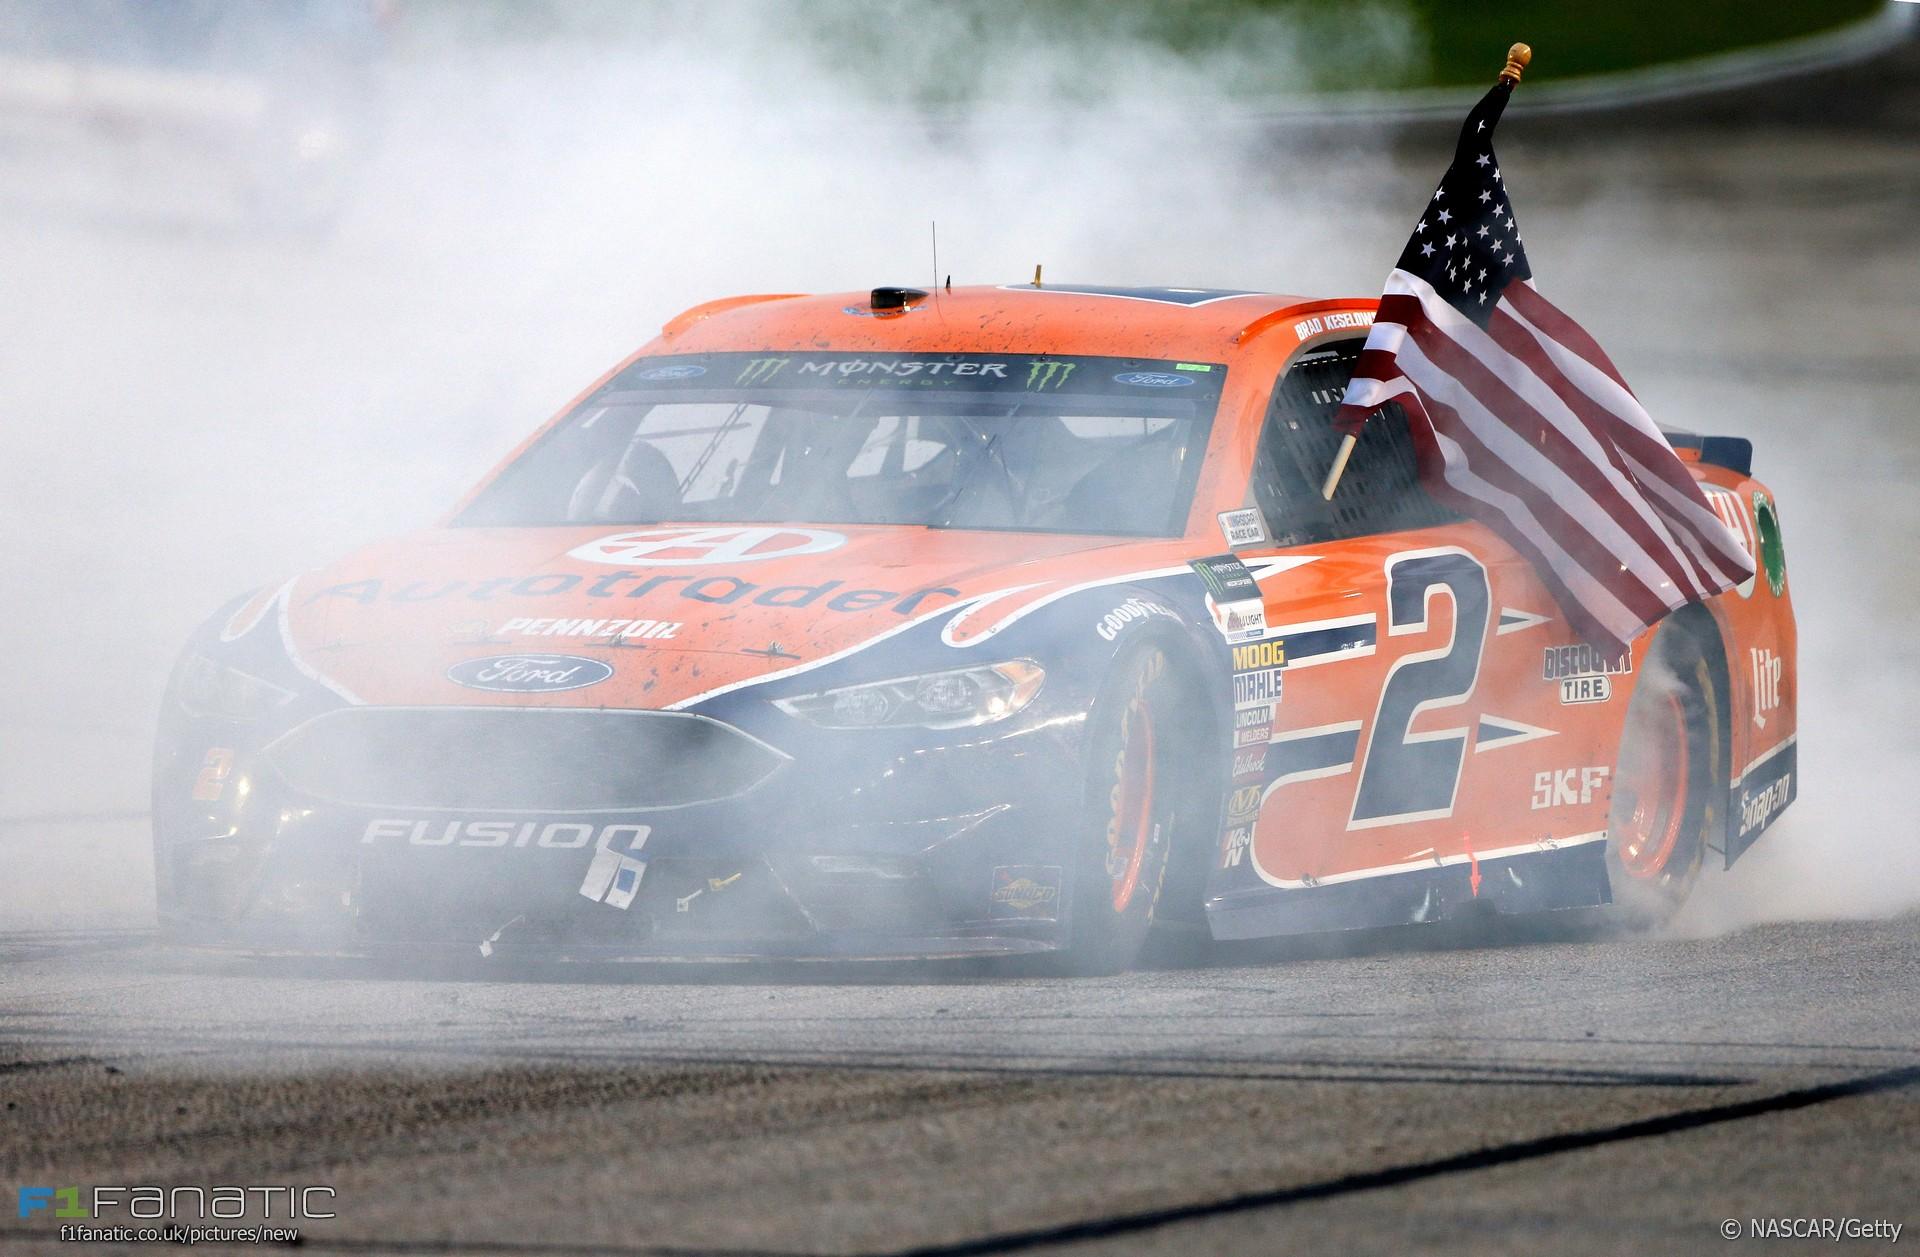 Brad Keselowski, NASCAR, Atlanta, 2017